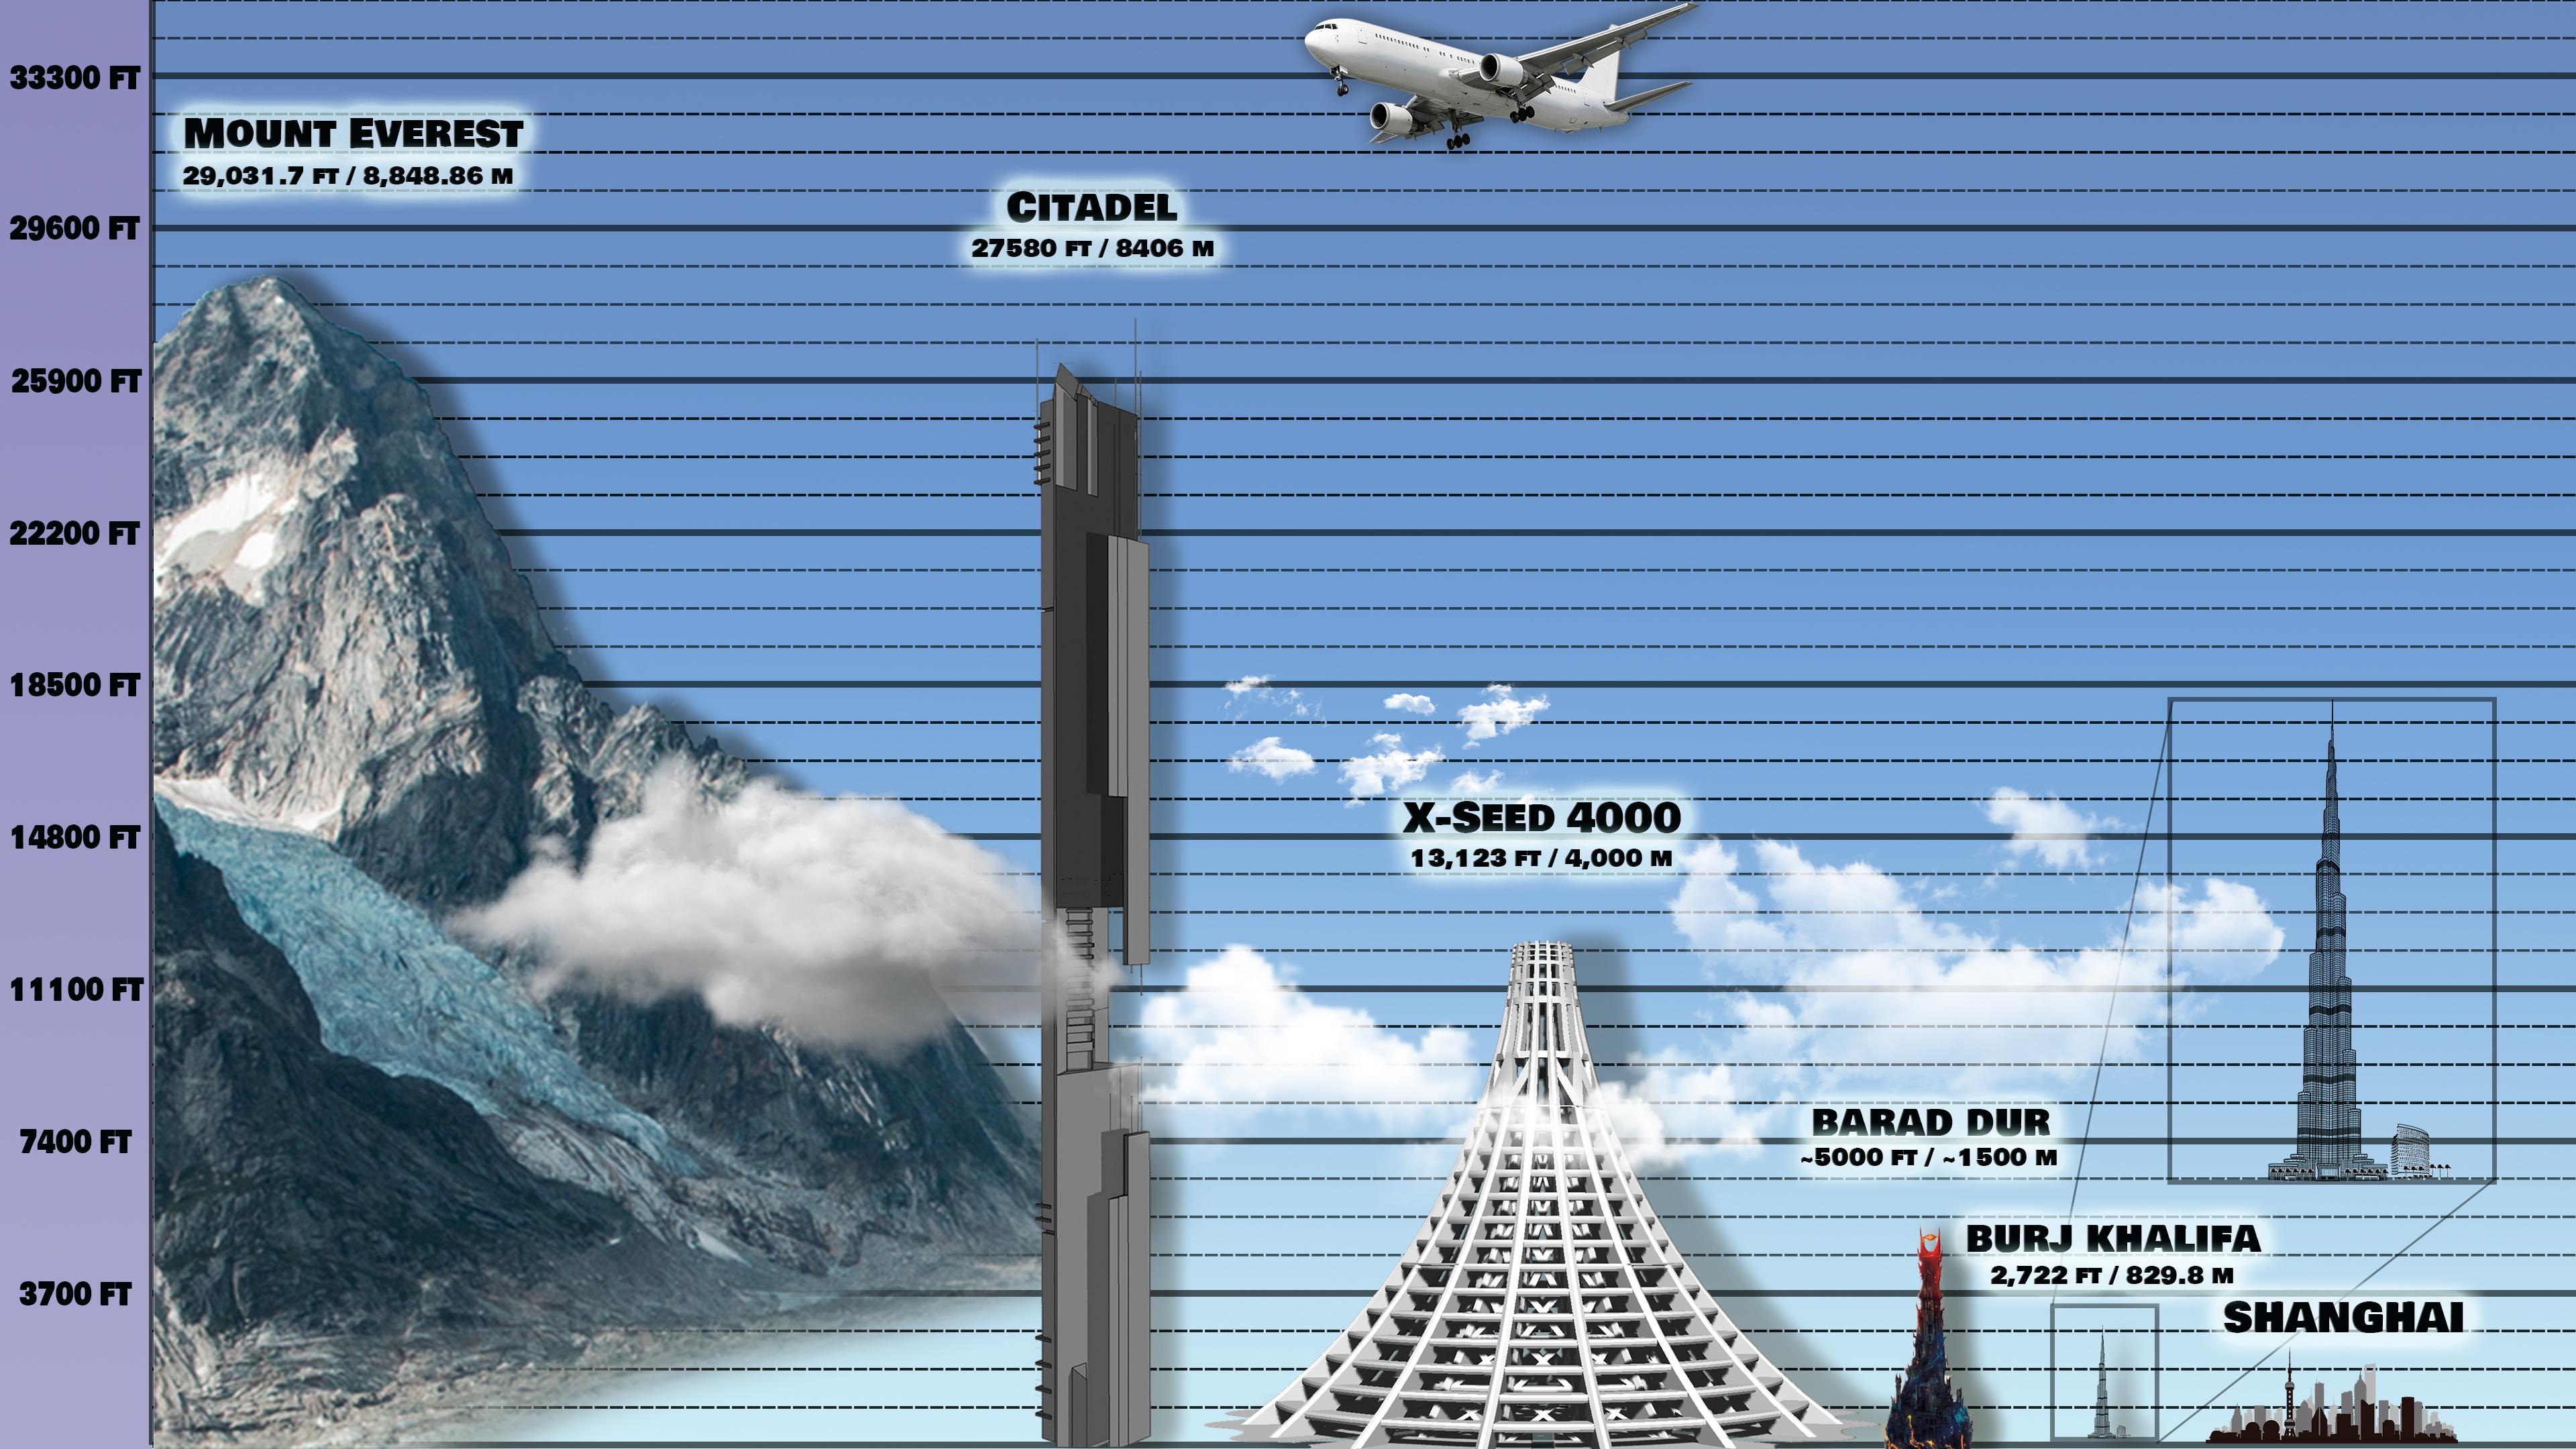 Citadel height